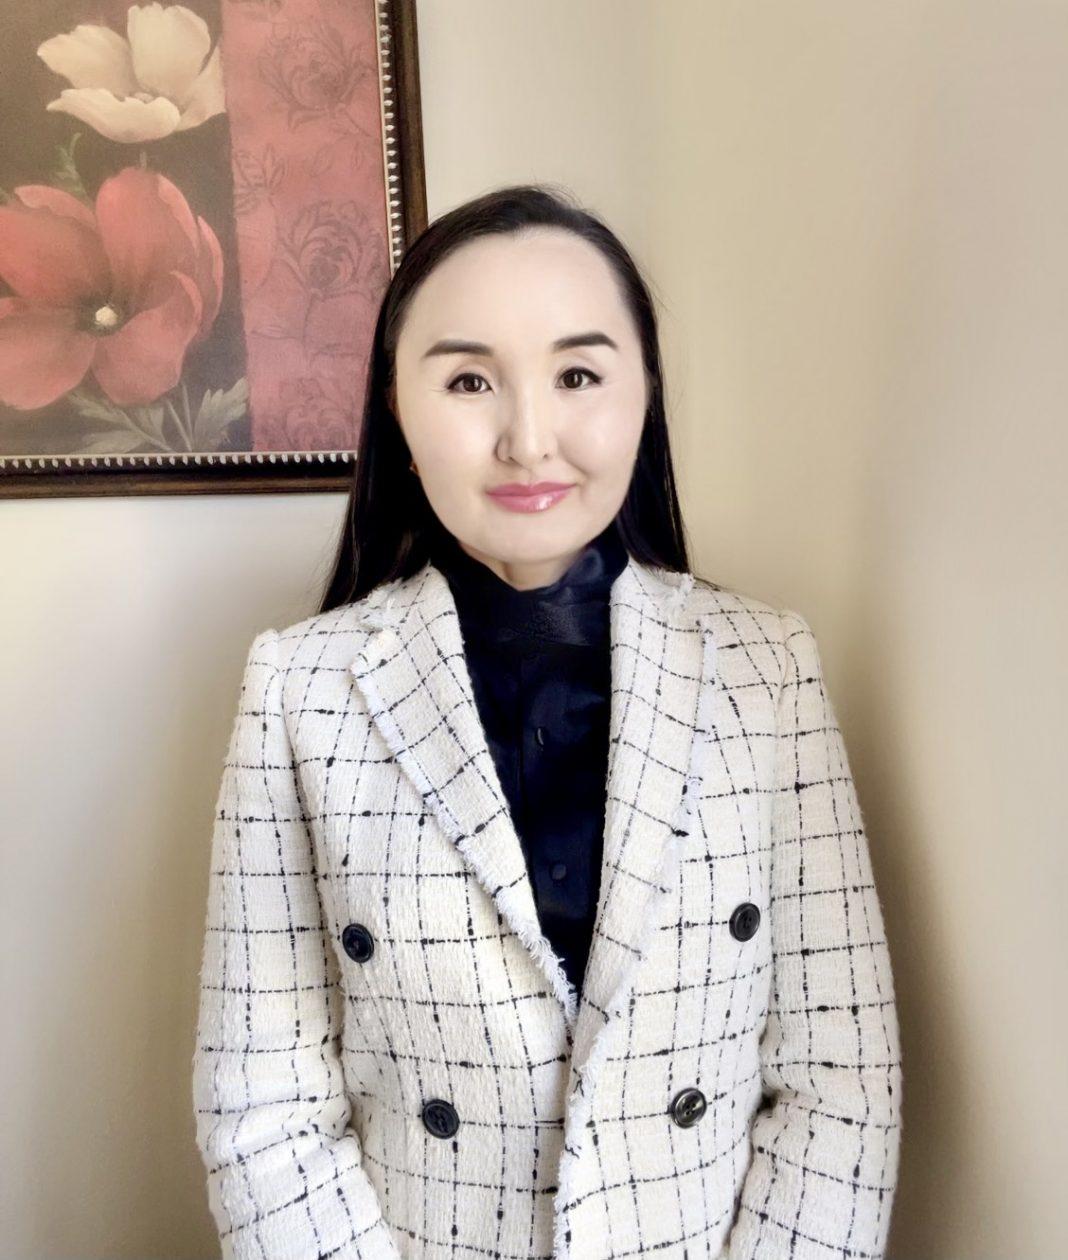 How the Entrepreneurial Skills of B Sue Chuluun Built an Online Fitness Empire